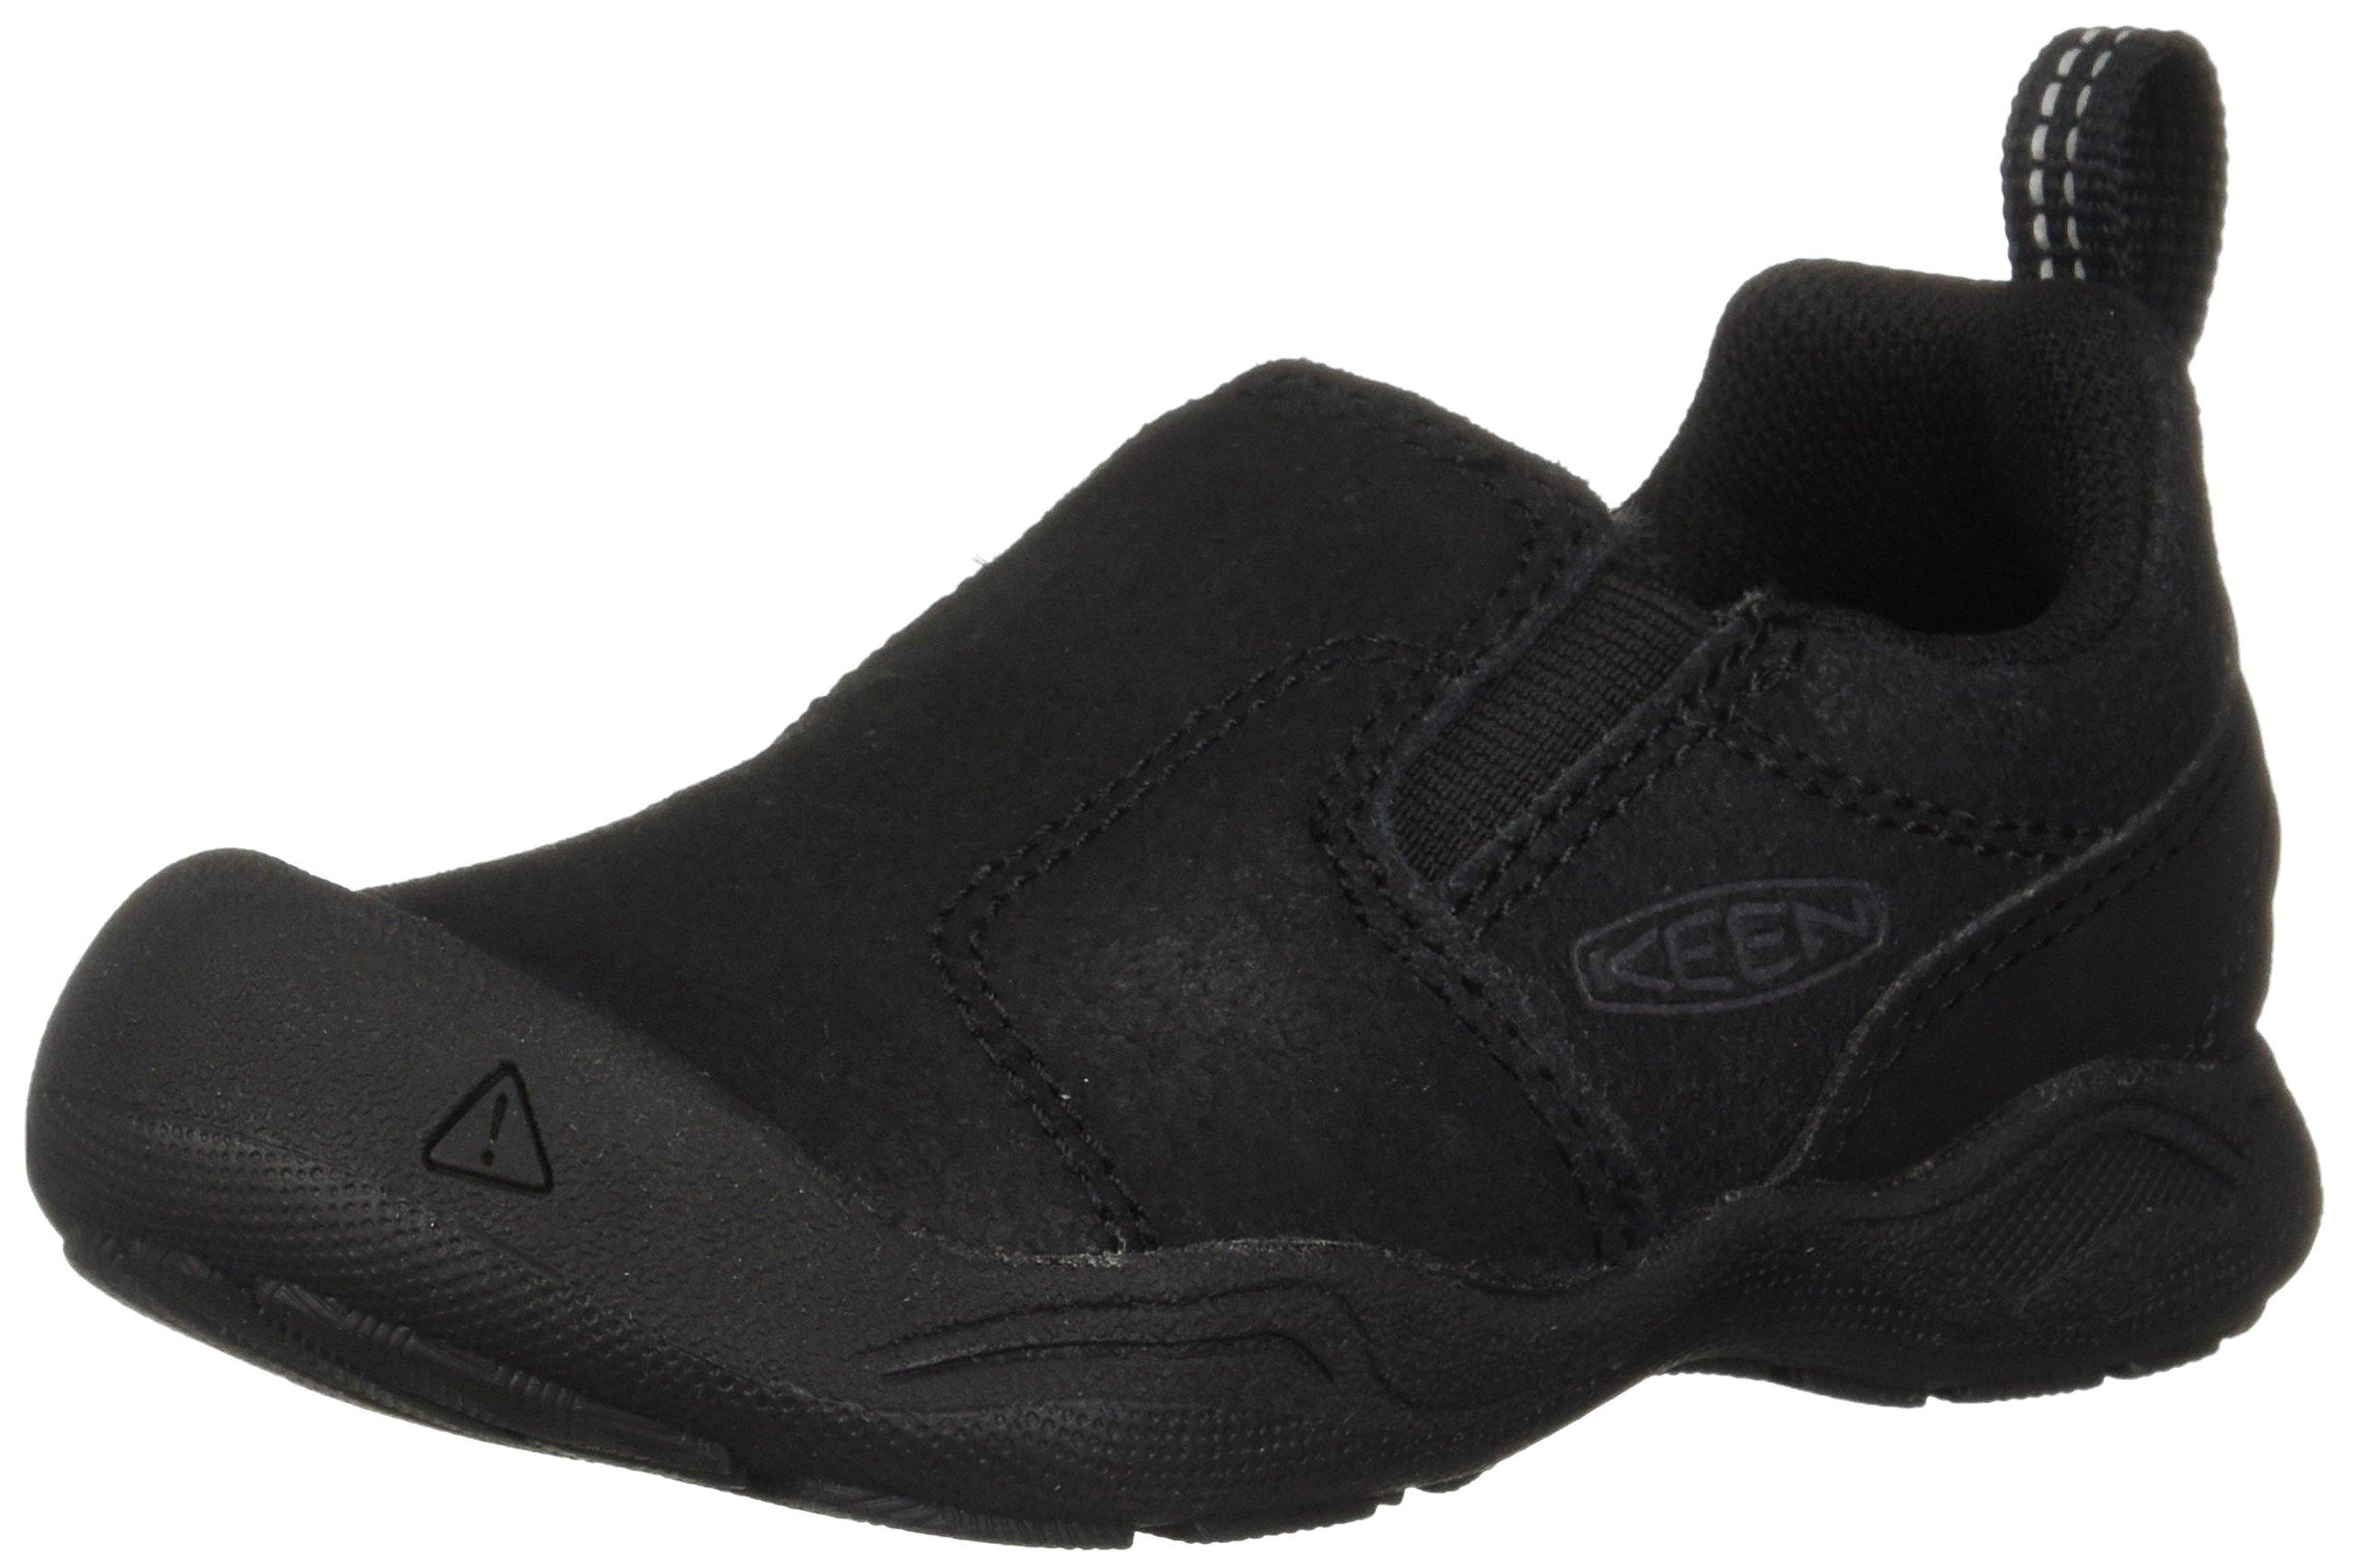 KEEN Unisex Jasper Slip-ON Hiking Shoe, Black/Raven, 12 M US Little Kid